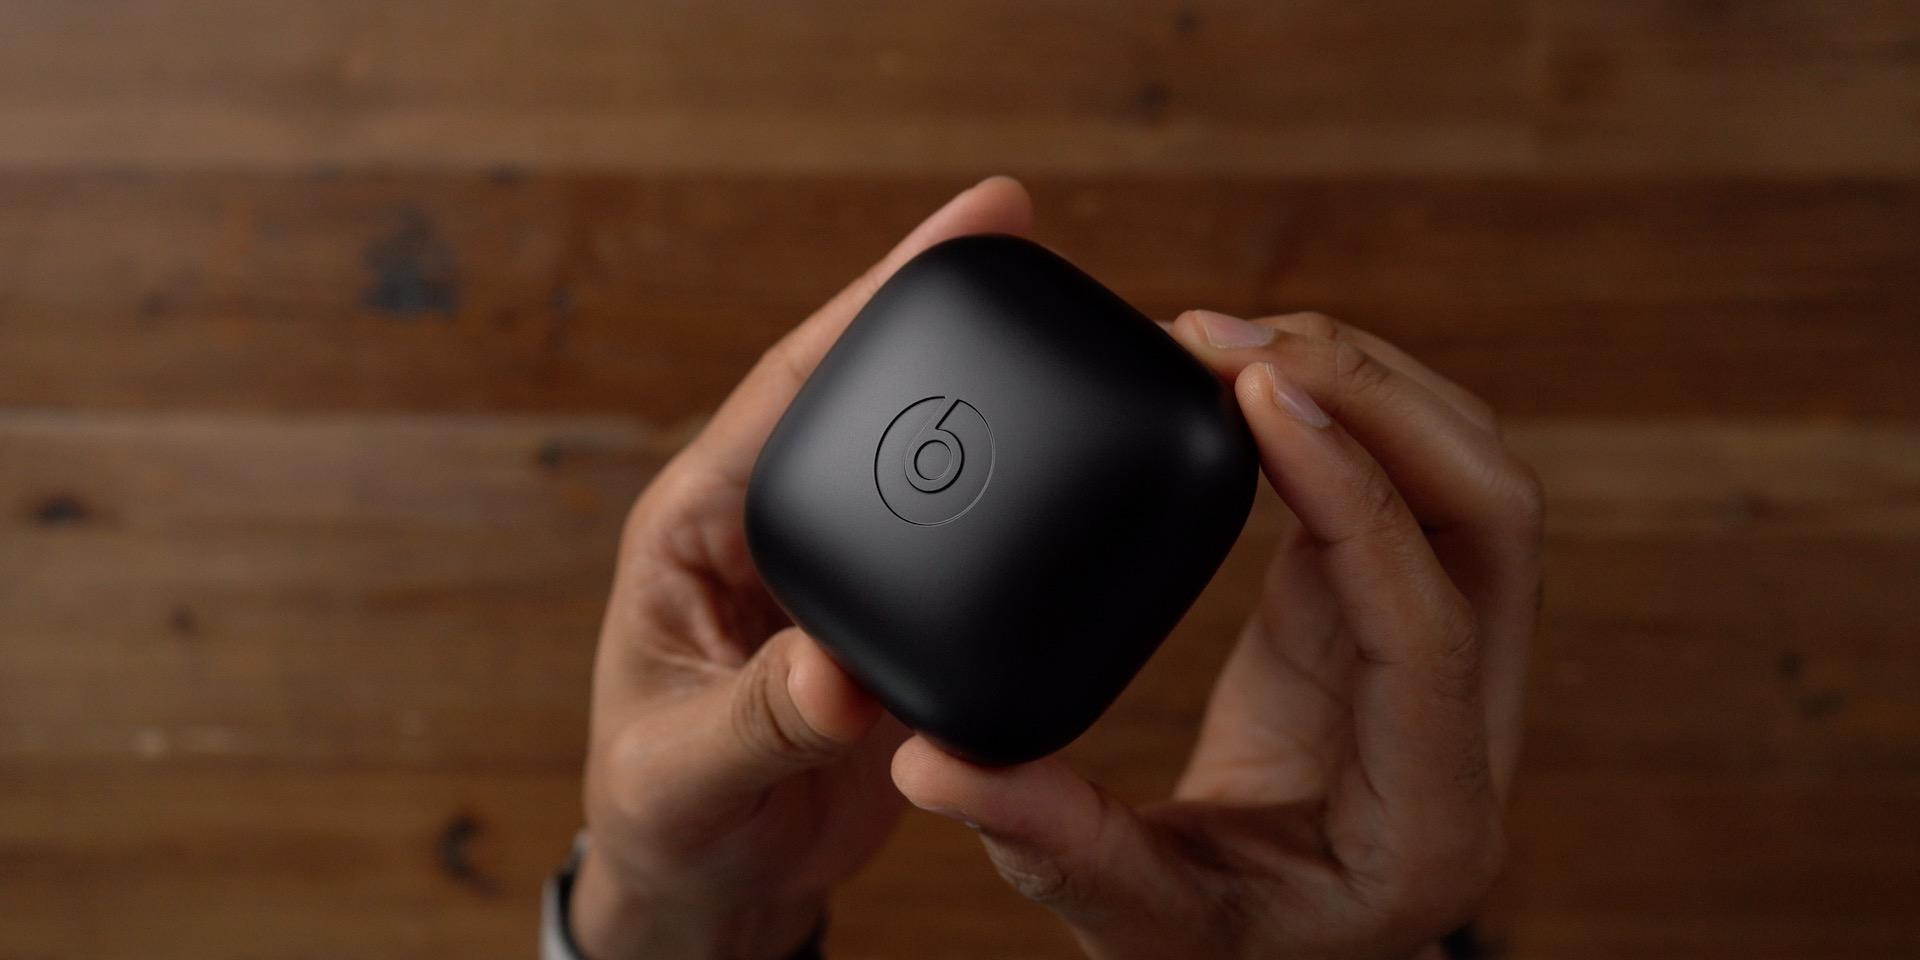 Hands-on with Beats Powerbeats Pro totally wireless earphones [Video]